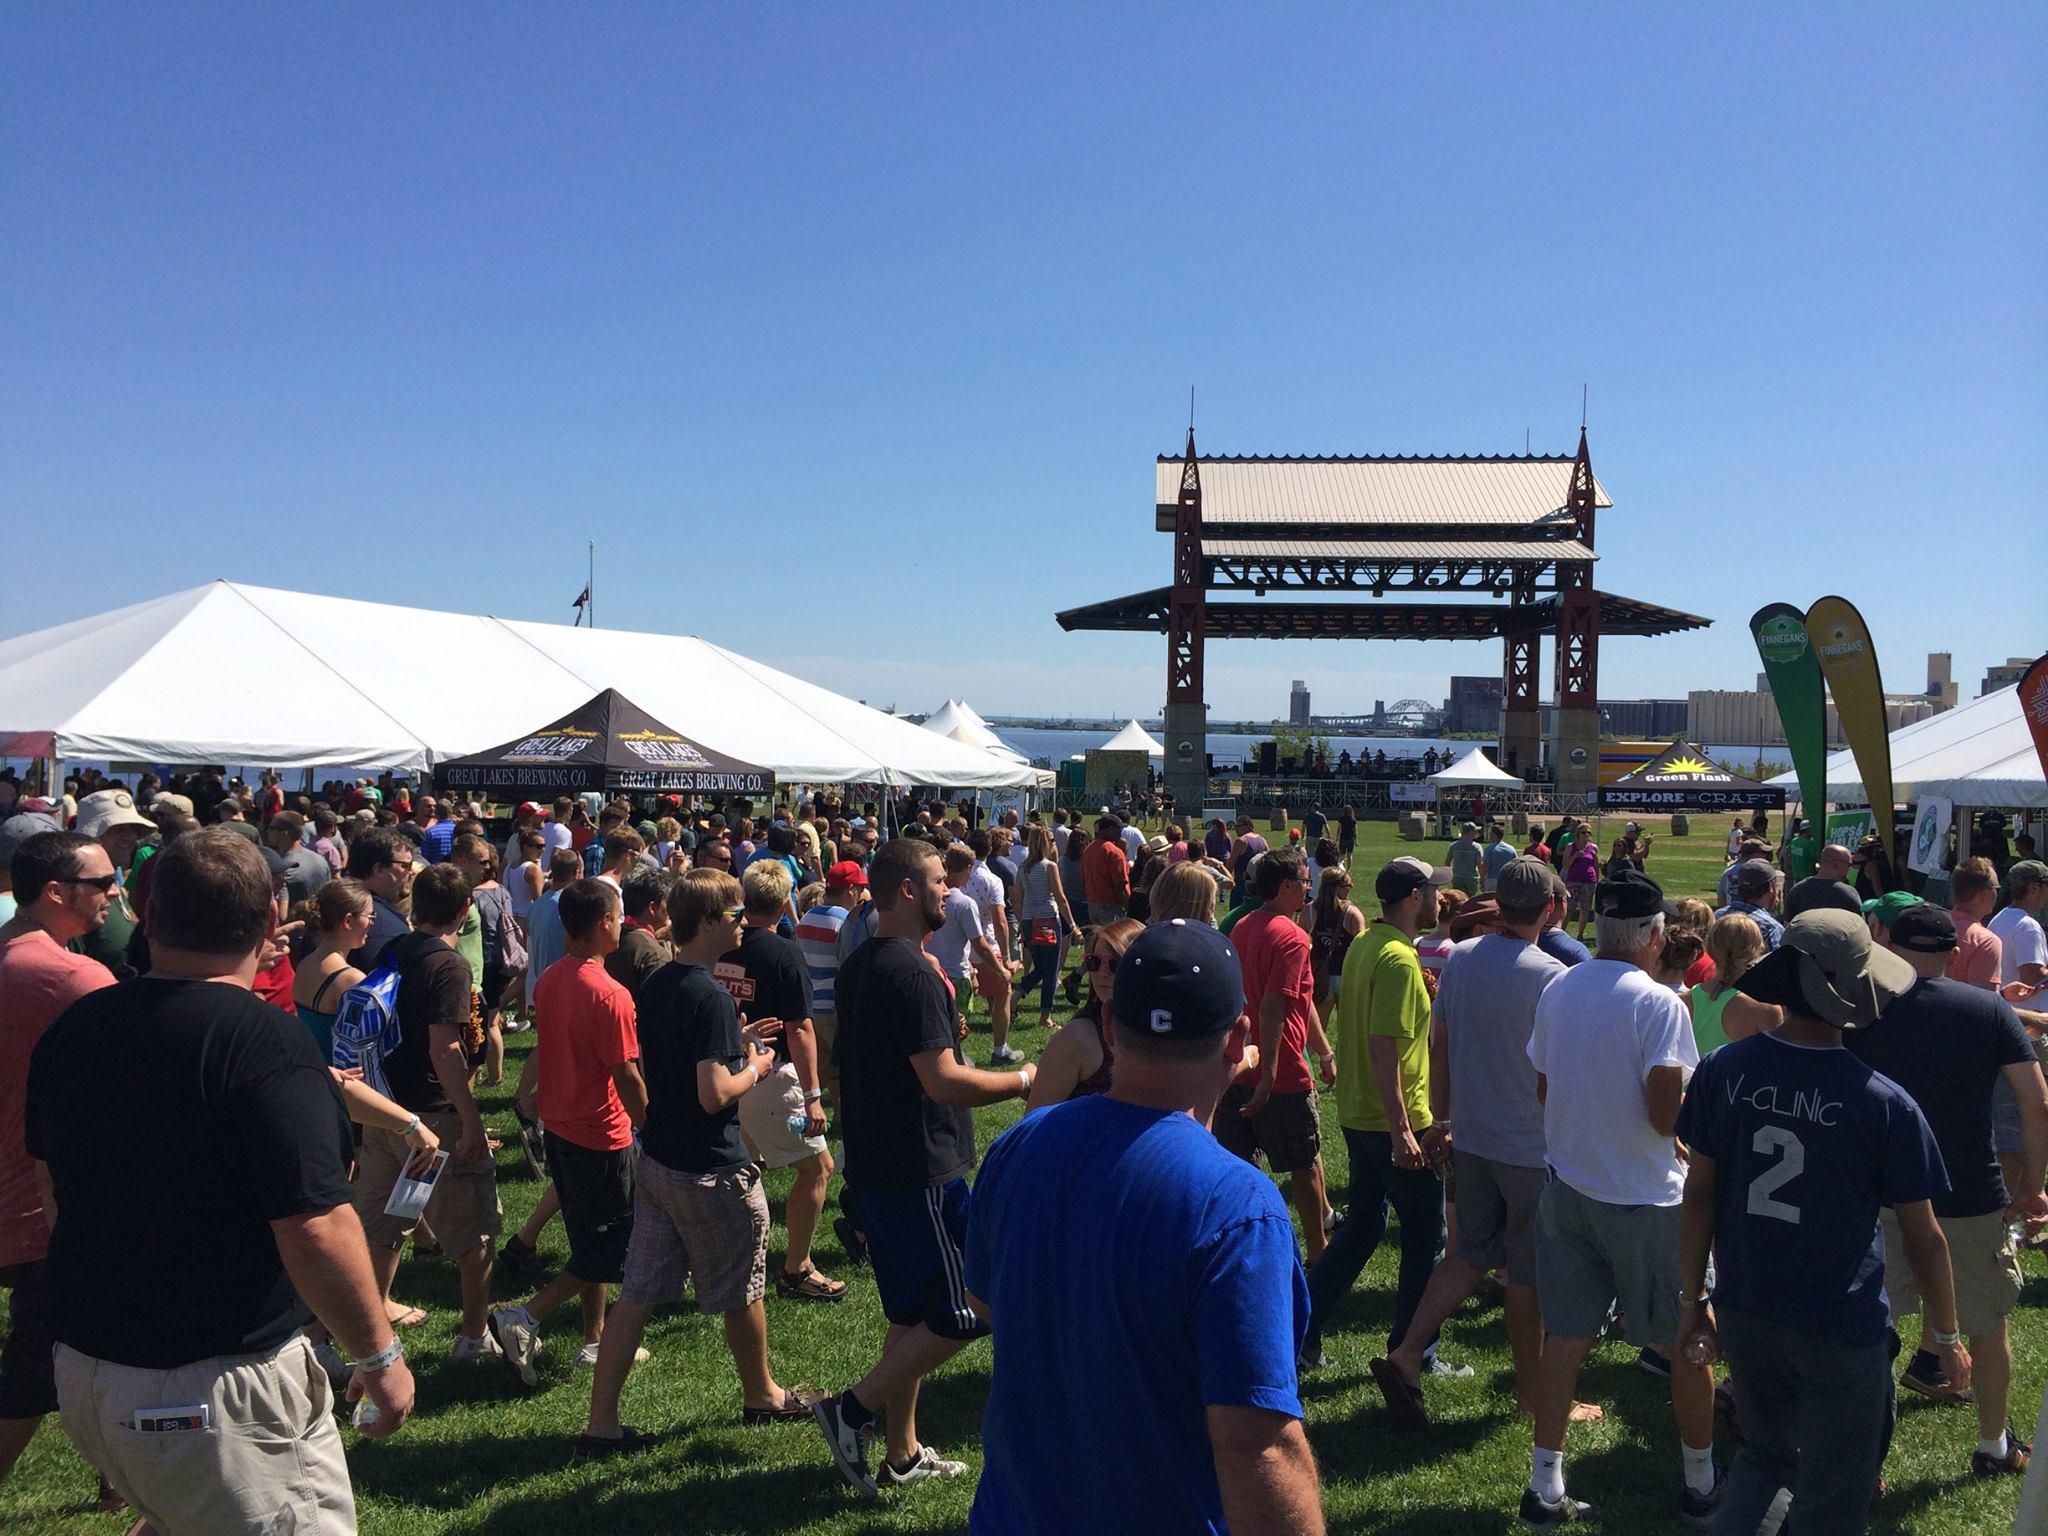 Allpints for Minnesota craft beer festival